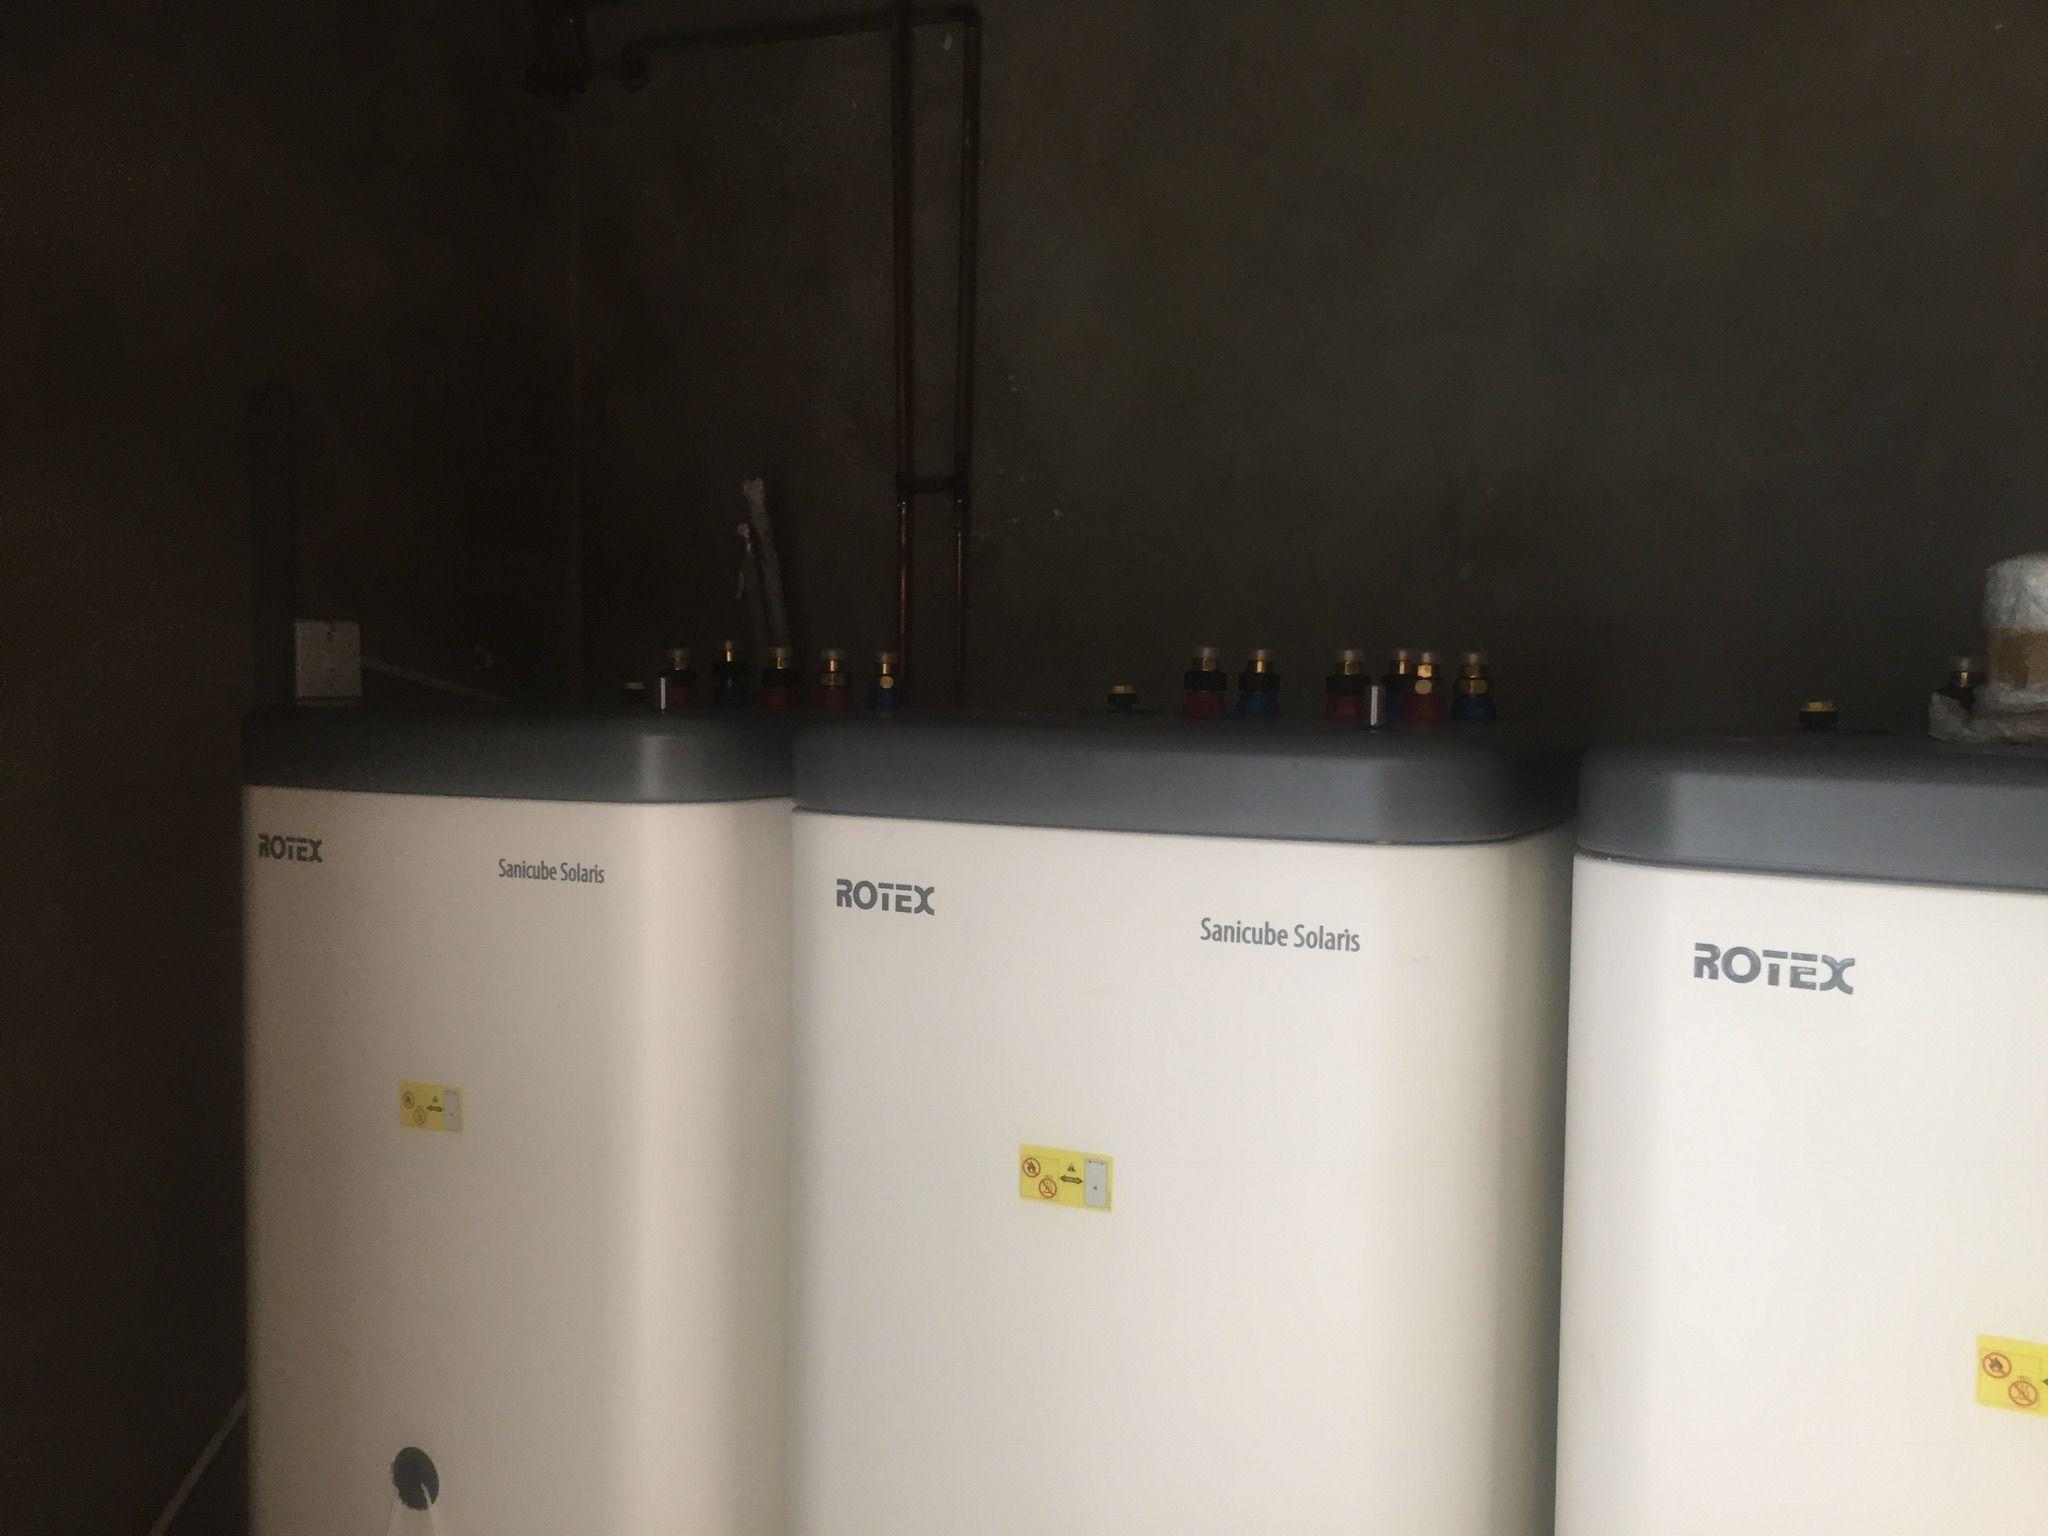 Pin By Michael John Carter On Hot Water Thermal Stores Hot Water Thermal Water